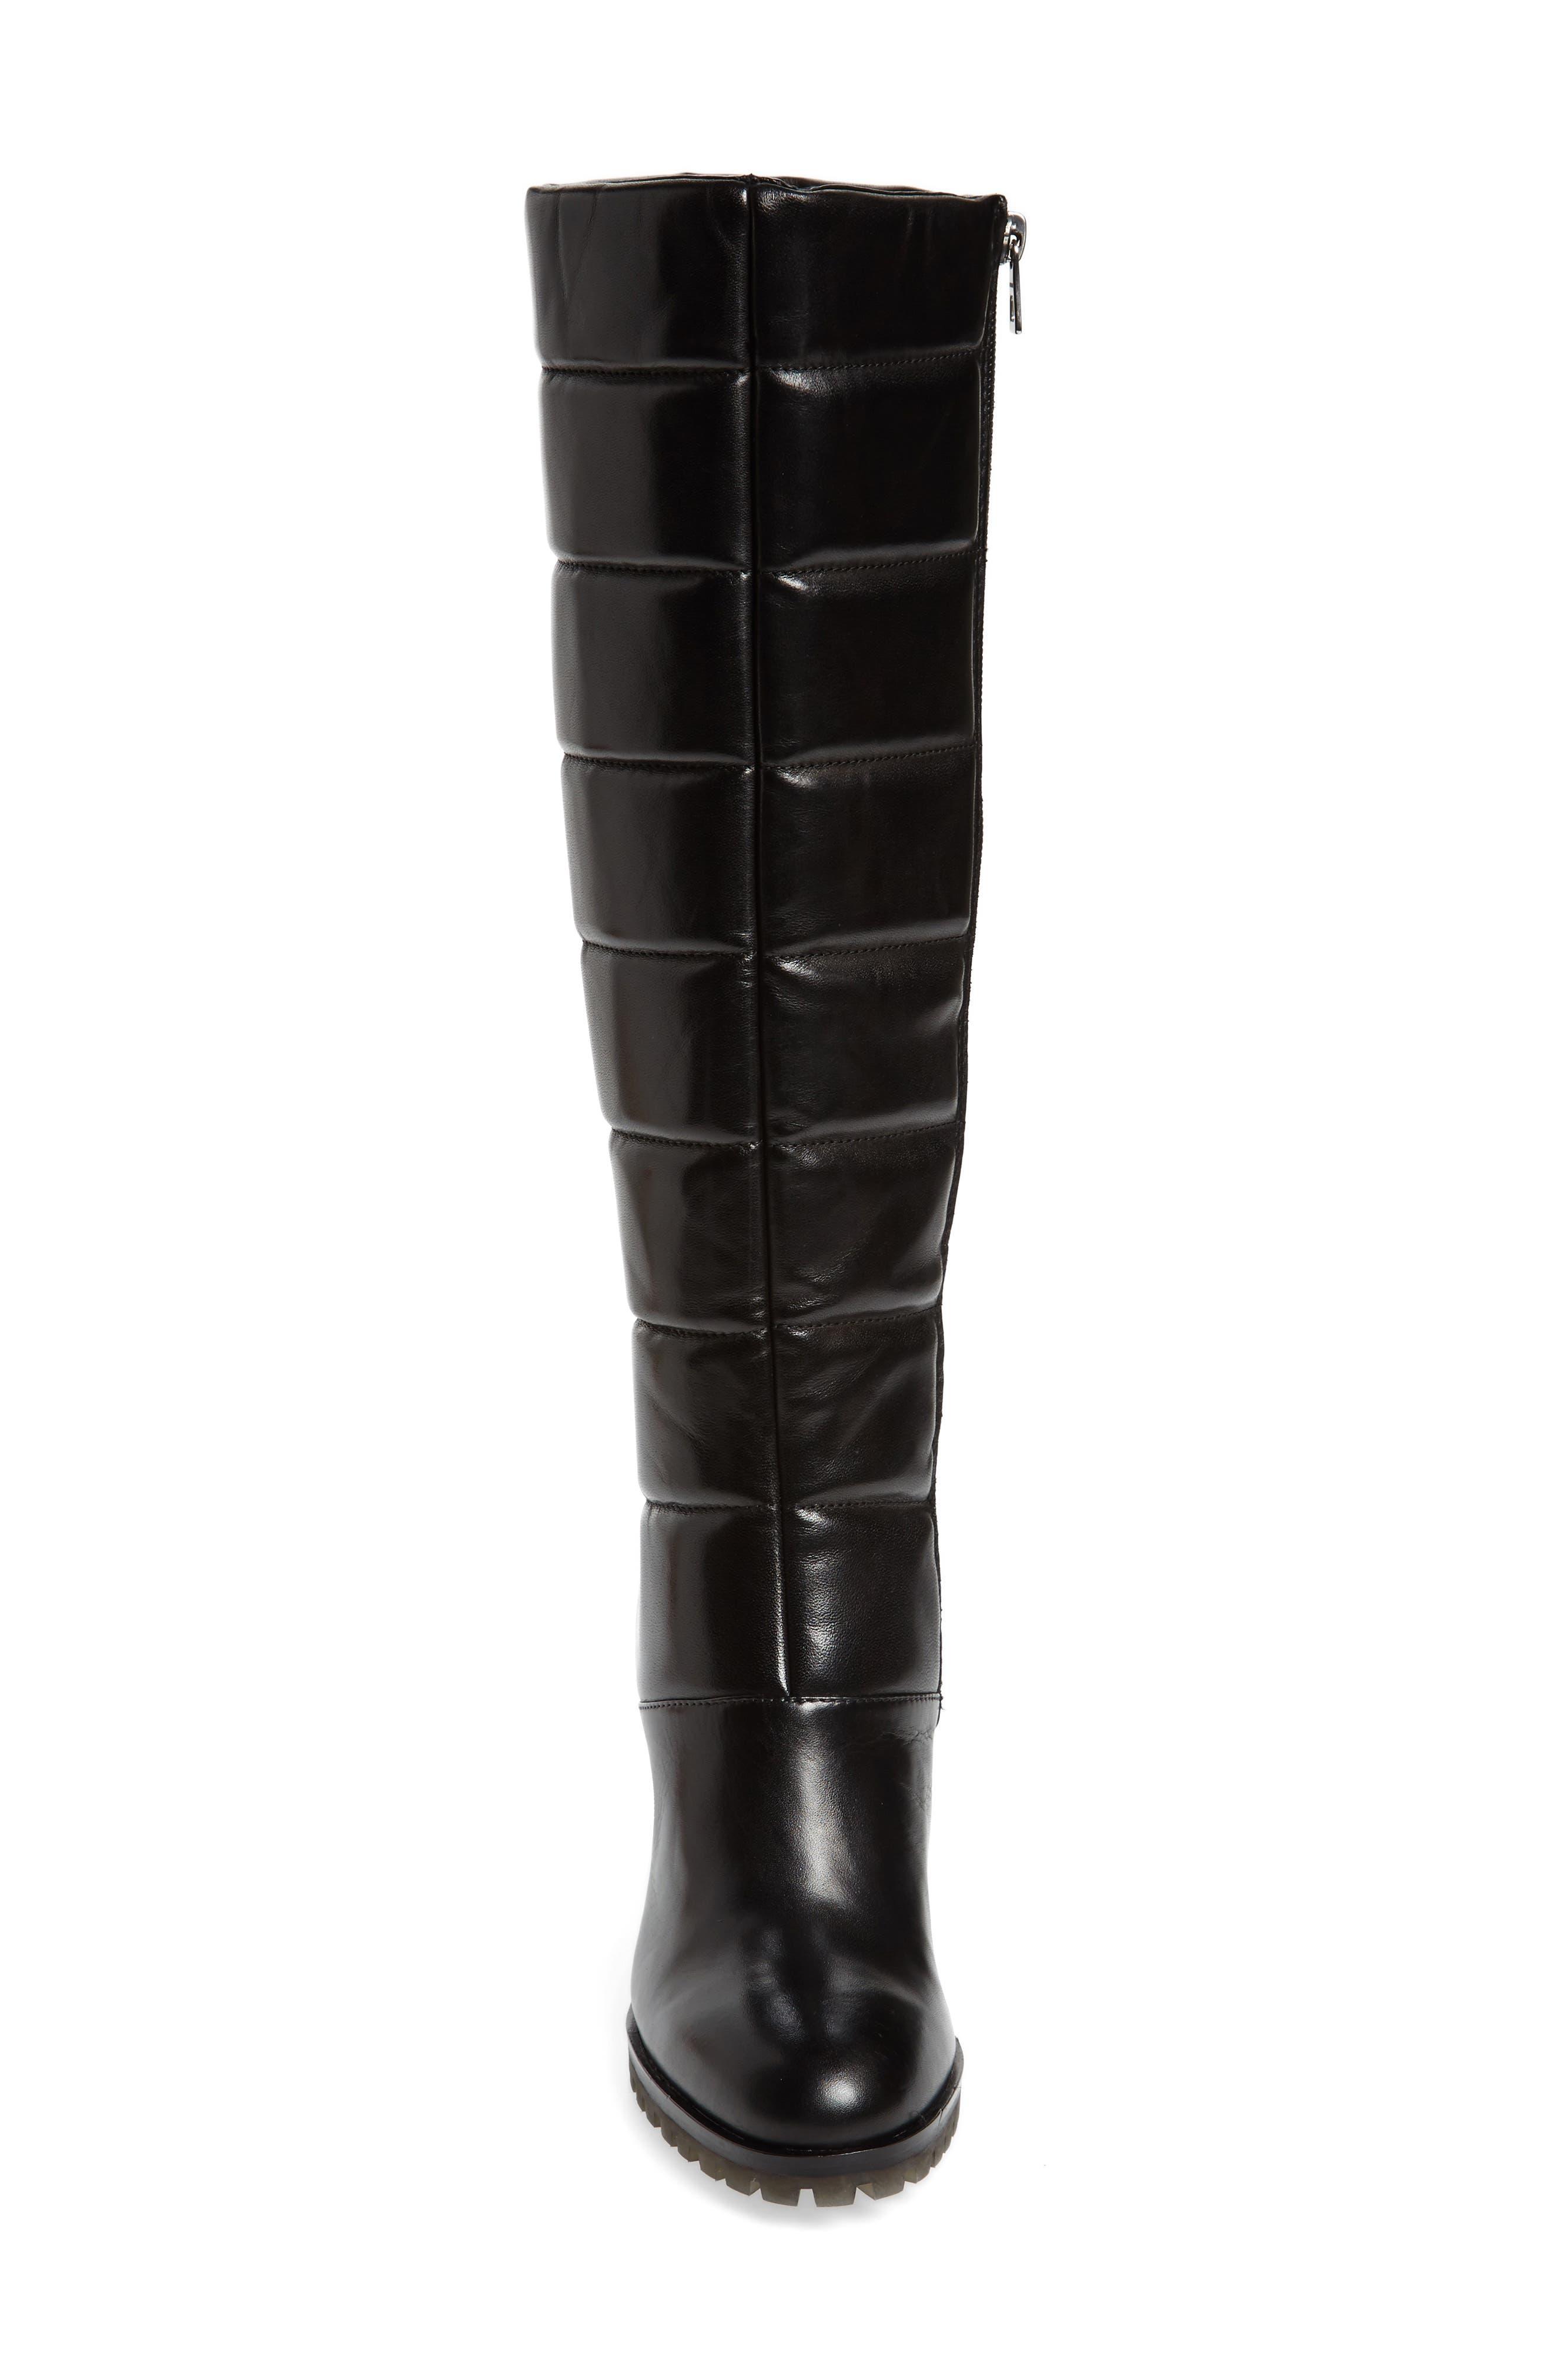 Tropia Knee High Boot,                             Alternate thumbnail 4, color,                             Black Leather